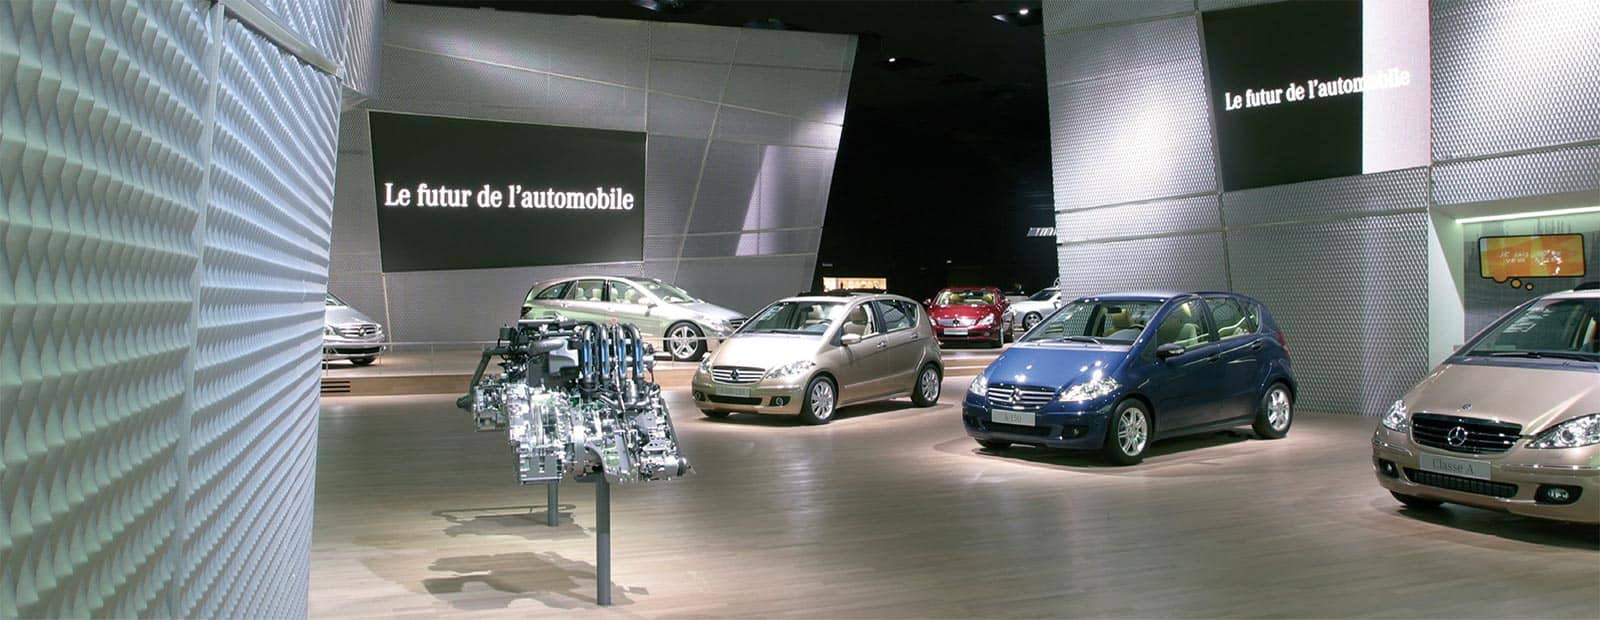 Ausstattung Stand Mercedes